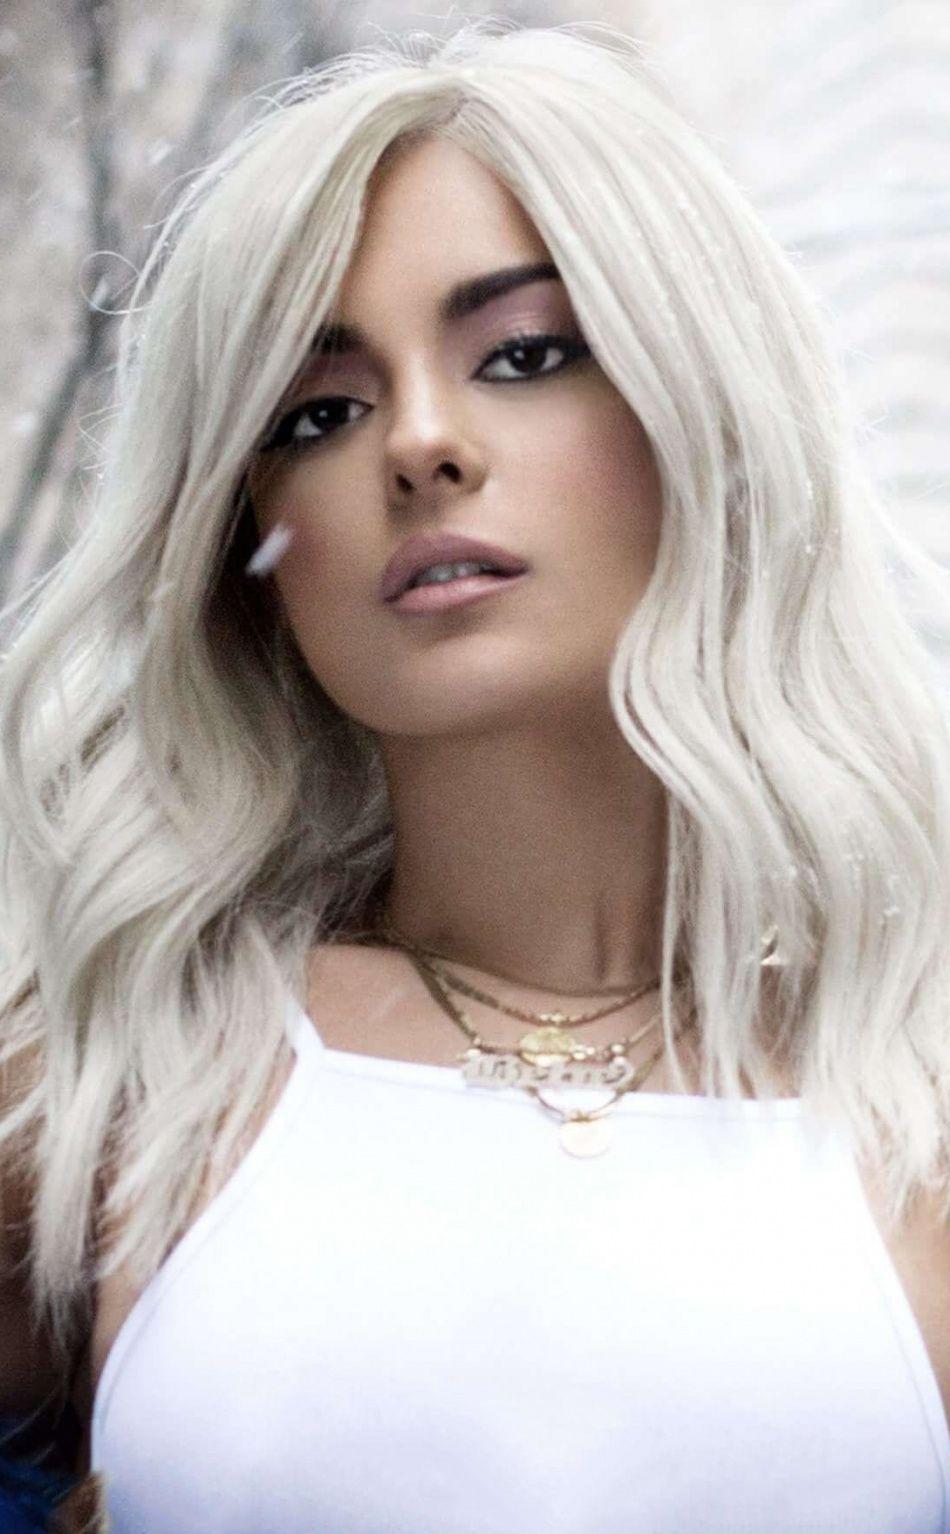 Snowfall White Hair Bebe Rexha Celebrity 950x1534 Wallpaper Bebe Rexha Bebe Rexa Bebe